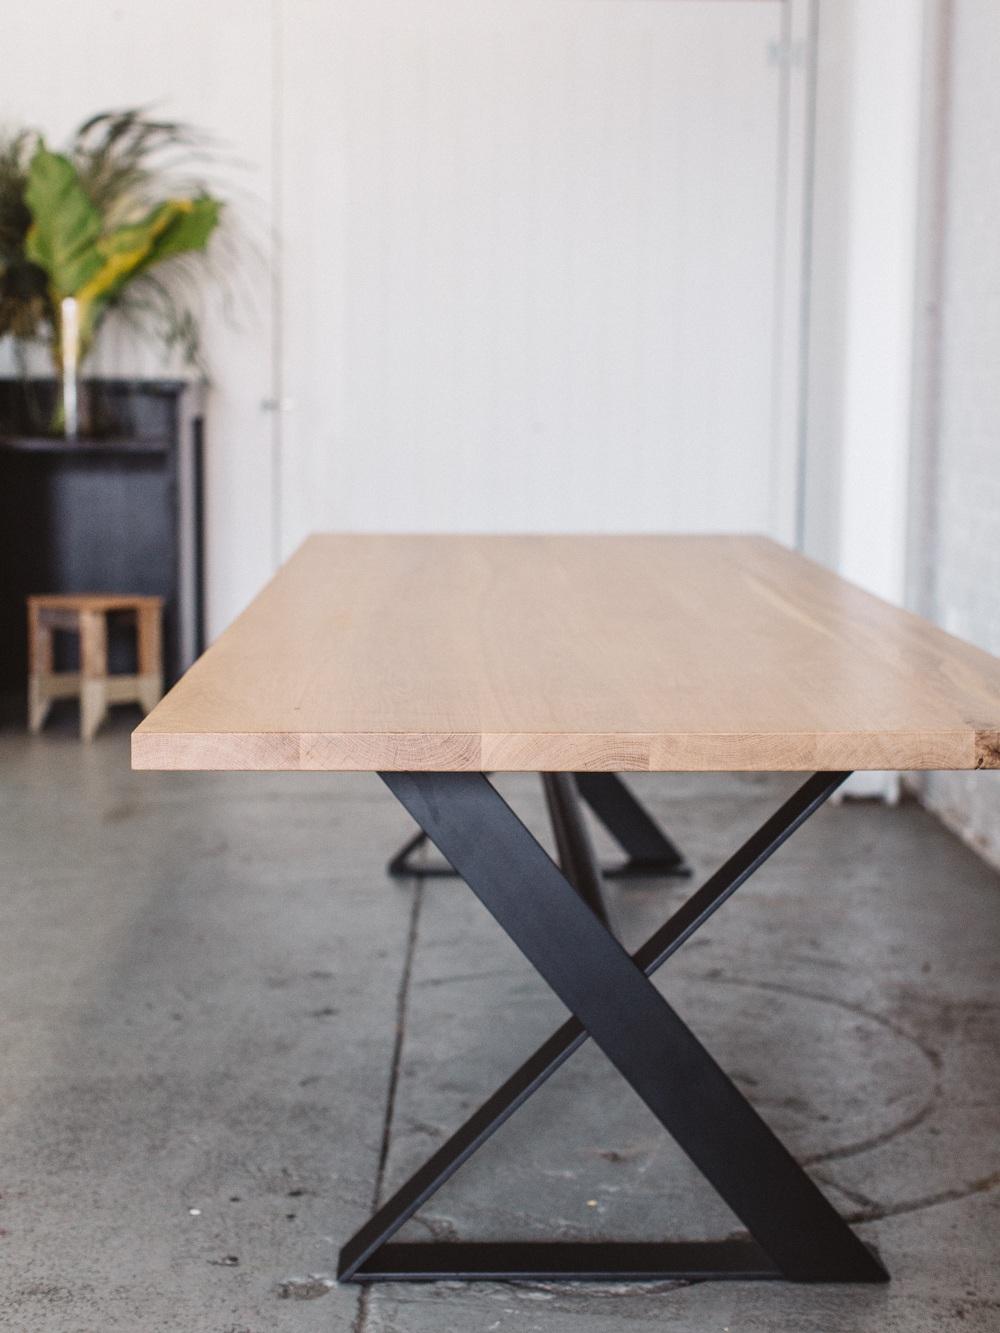 House+of+Alpine+White+Oak+Dining+Table+X+Base.jpg